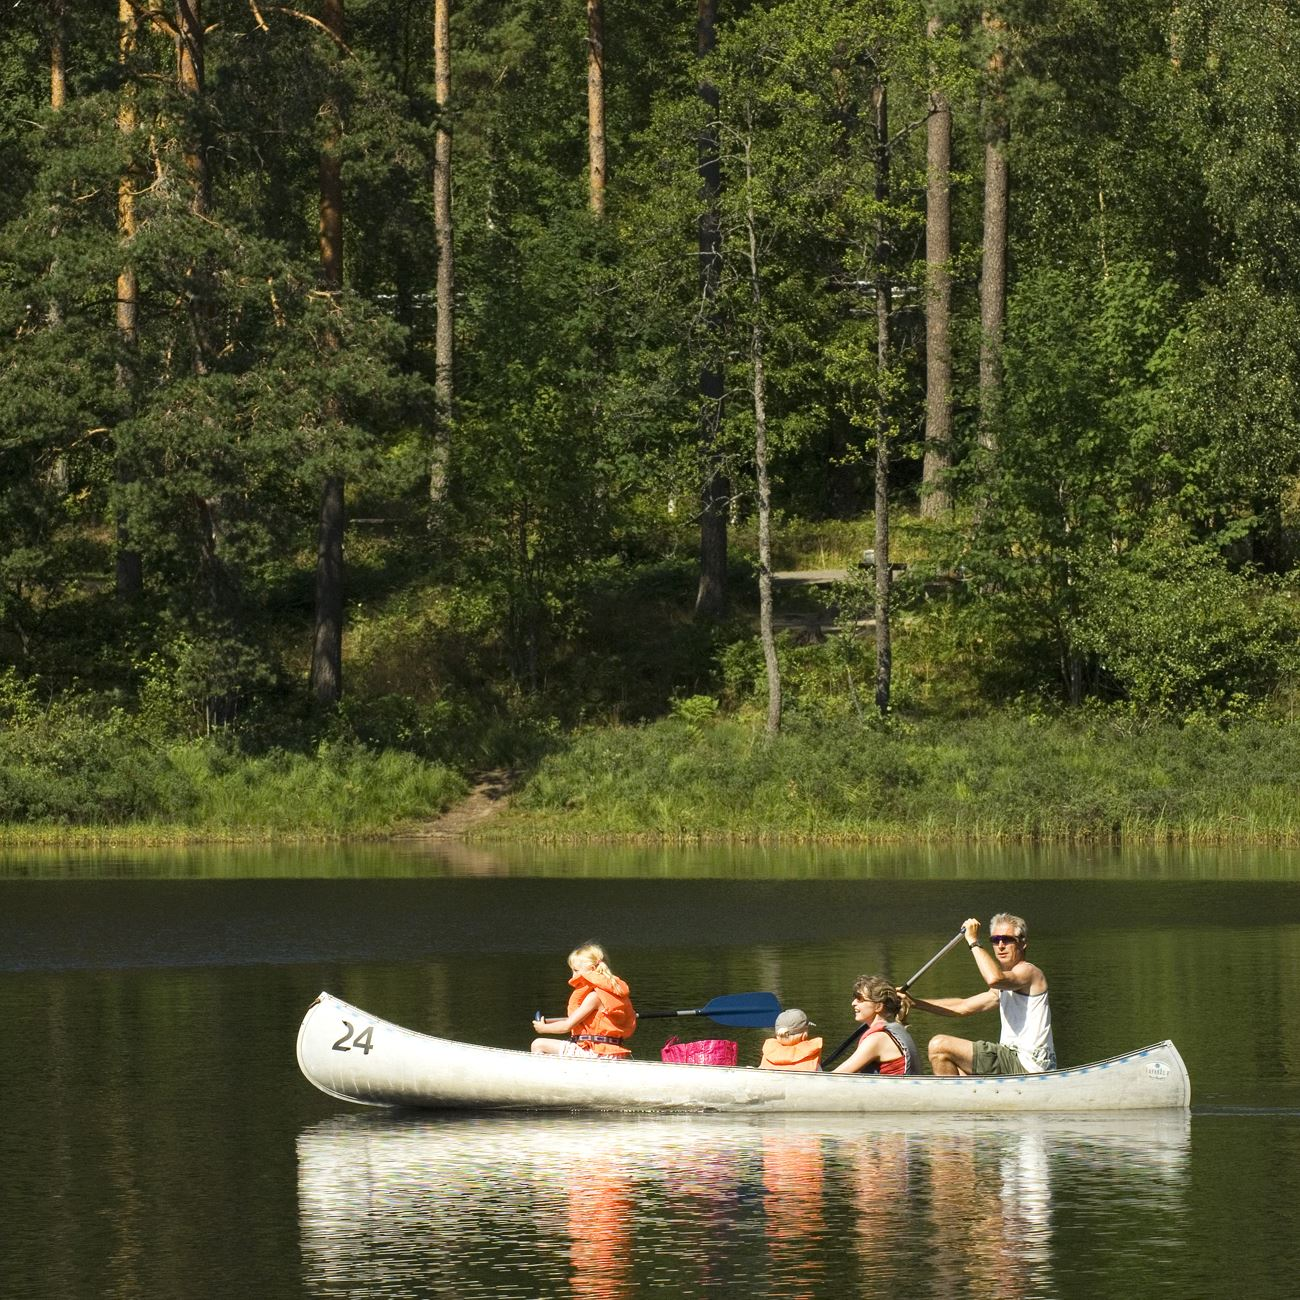 Smålandsbilder.se,  © Värnamo Näringsliv AB , Prostsjön - Kanu, Minigolf und Freizeit